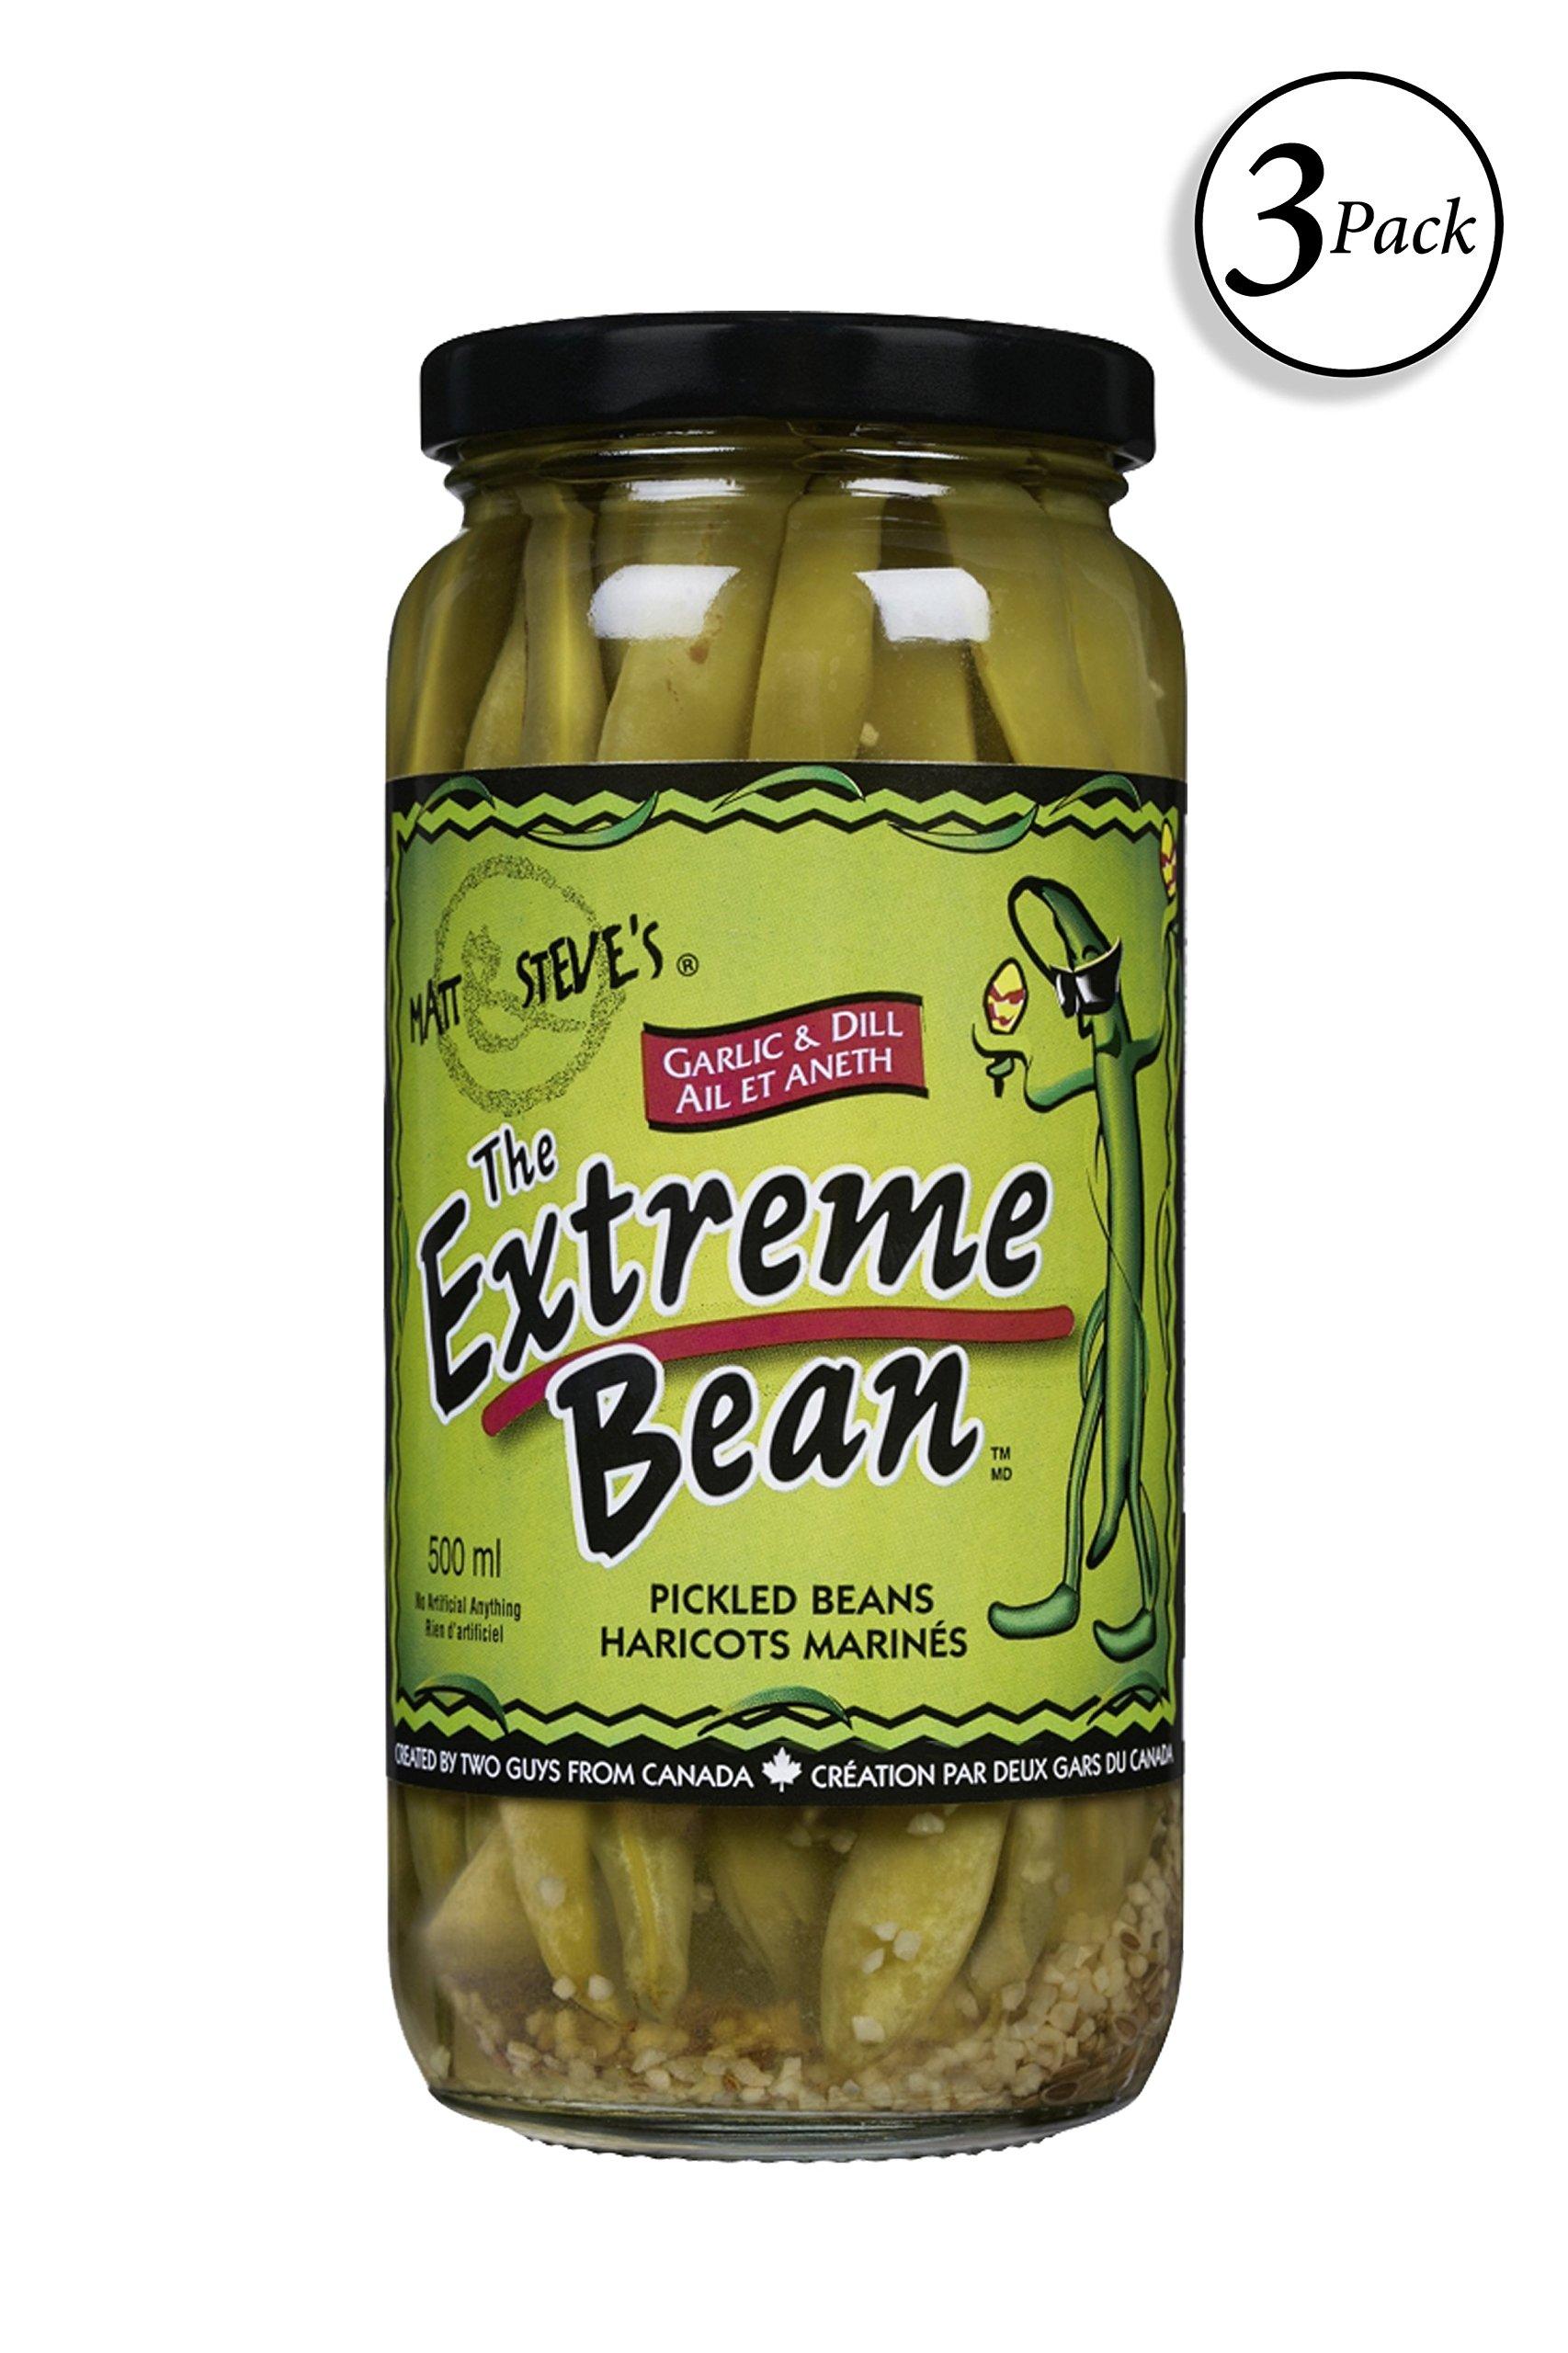 The Extreme Bean - Garlic & Dill, Pickled Green Beans. 16 oz (3 pack) by Matt & Steve's